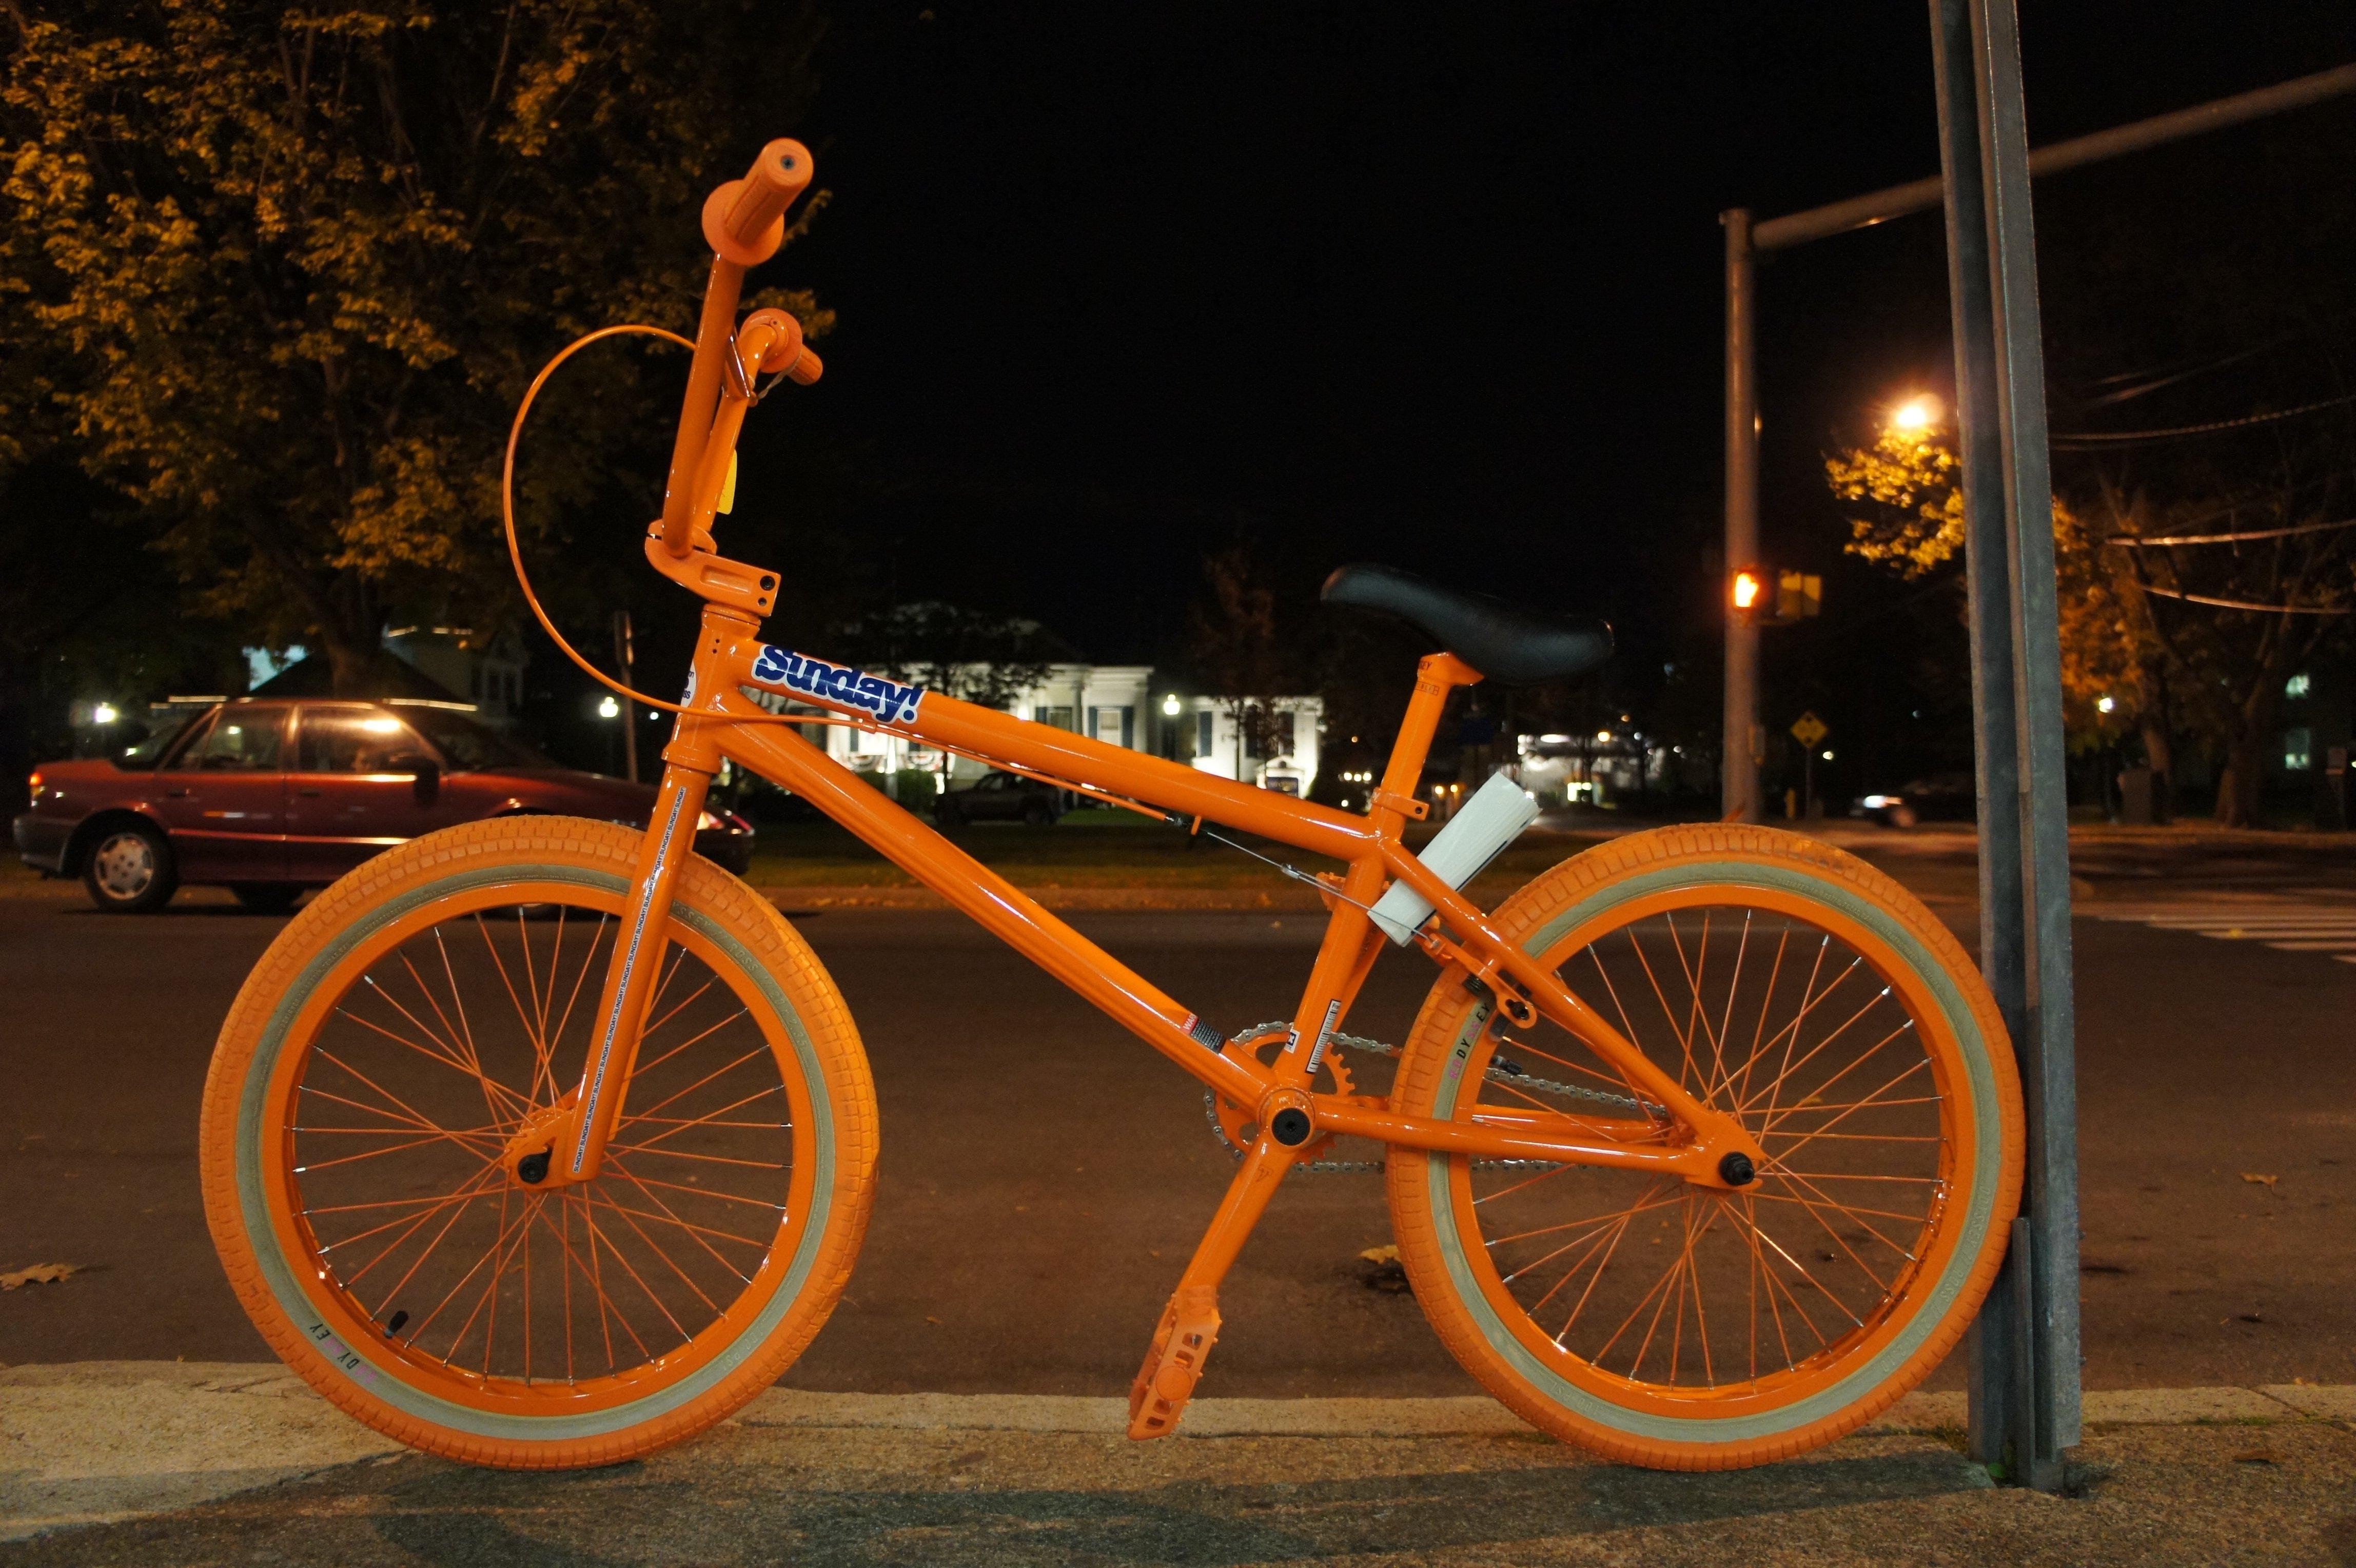 Download Bmx Bike Wallpapers Gallery: SUNDAY Bmx Bike Bicycle Wallpaper